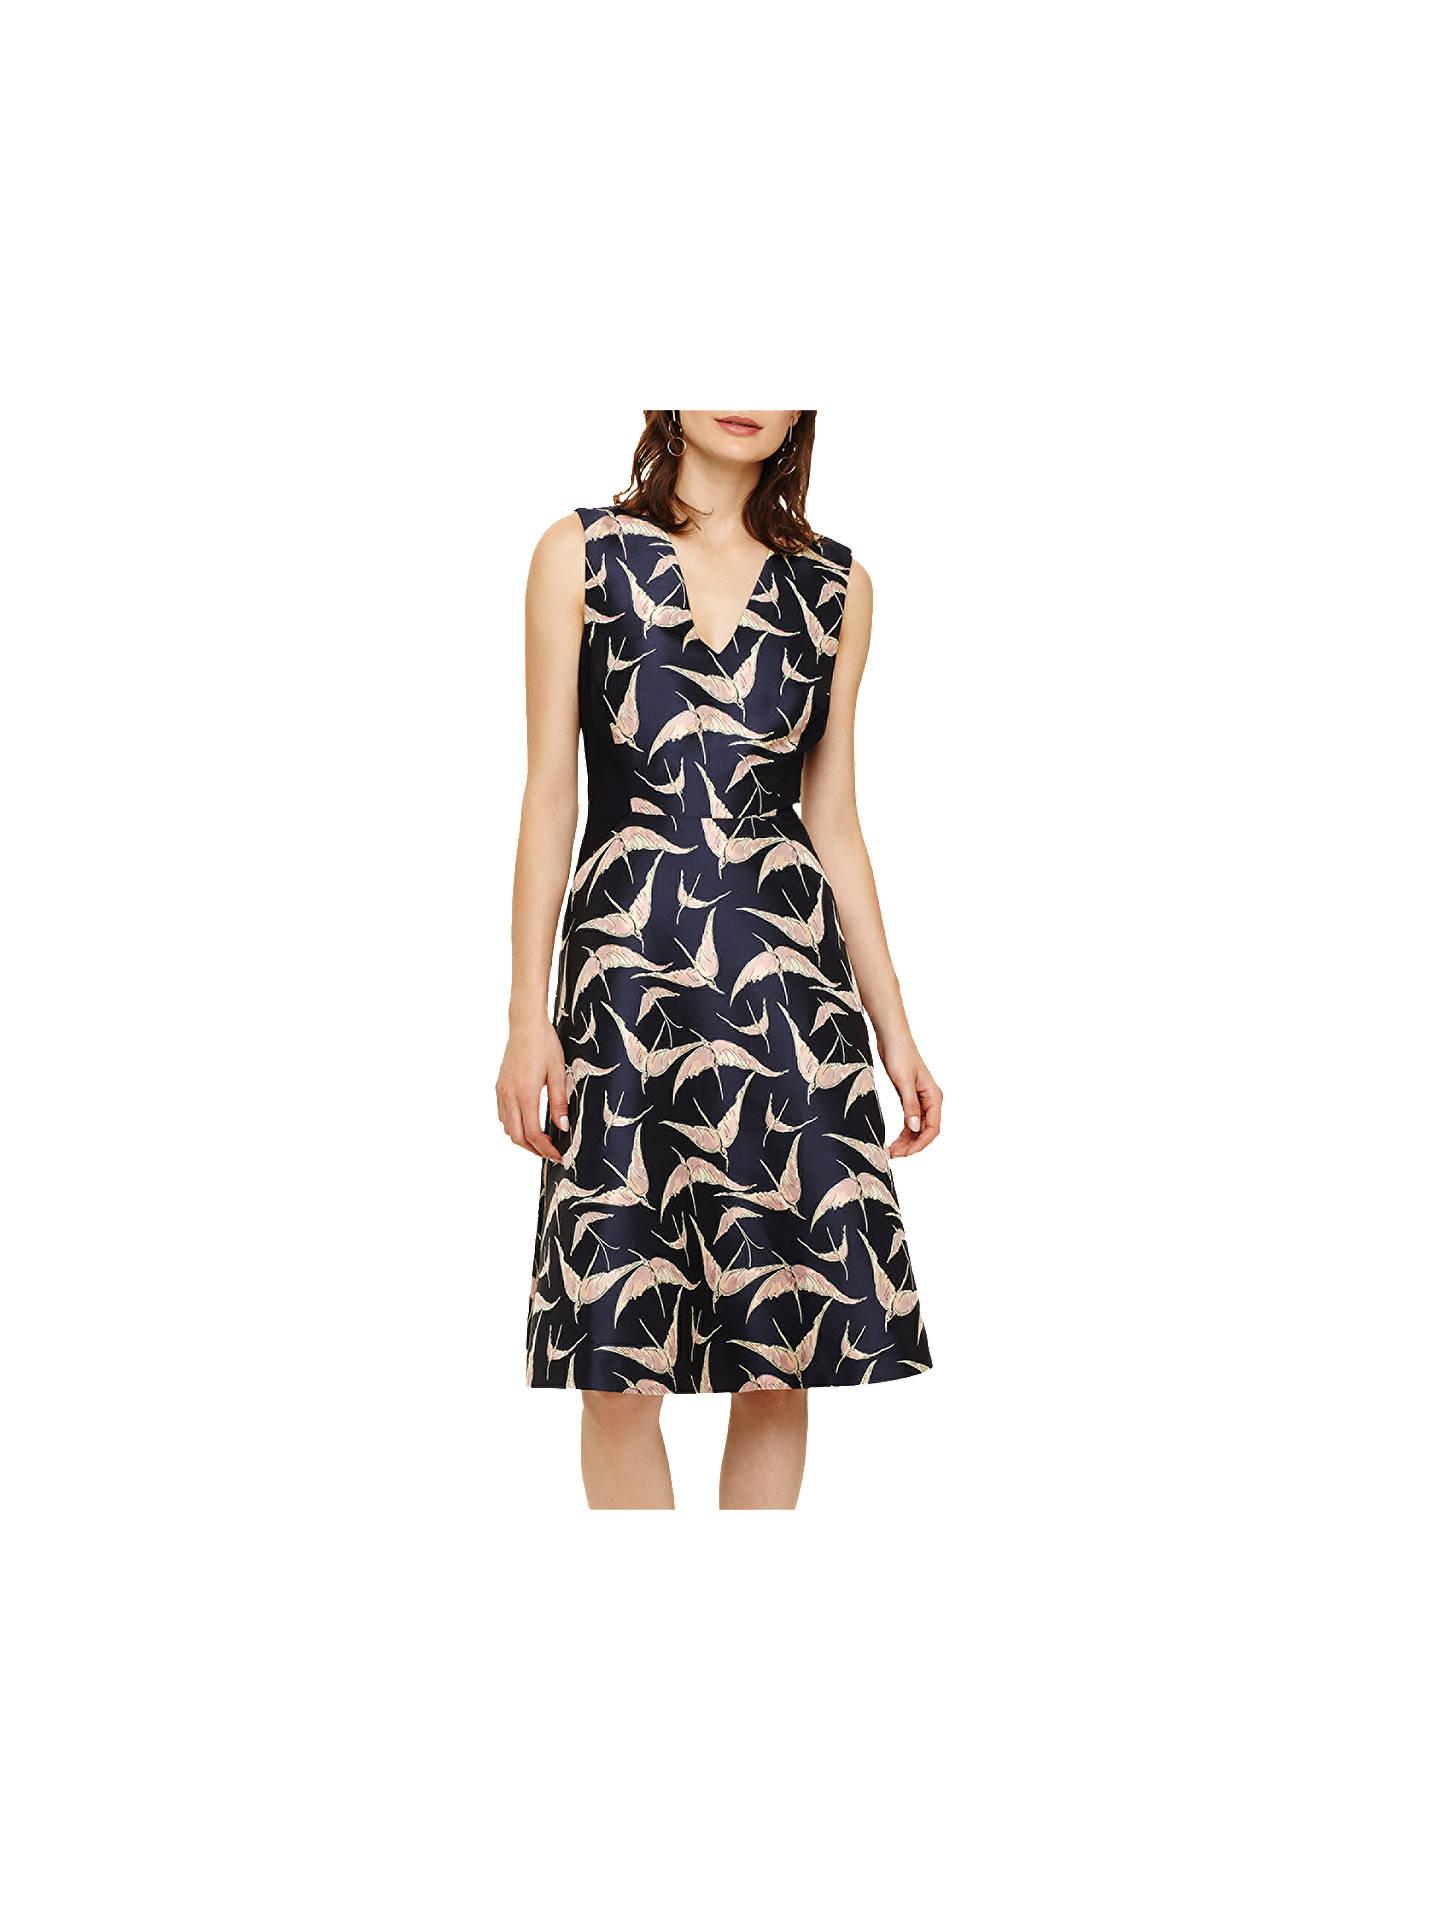 0fa187505b BuyDelaphine Dress BLMI 6 Online at johnlewis.com ...